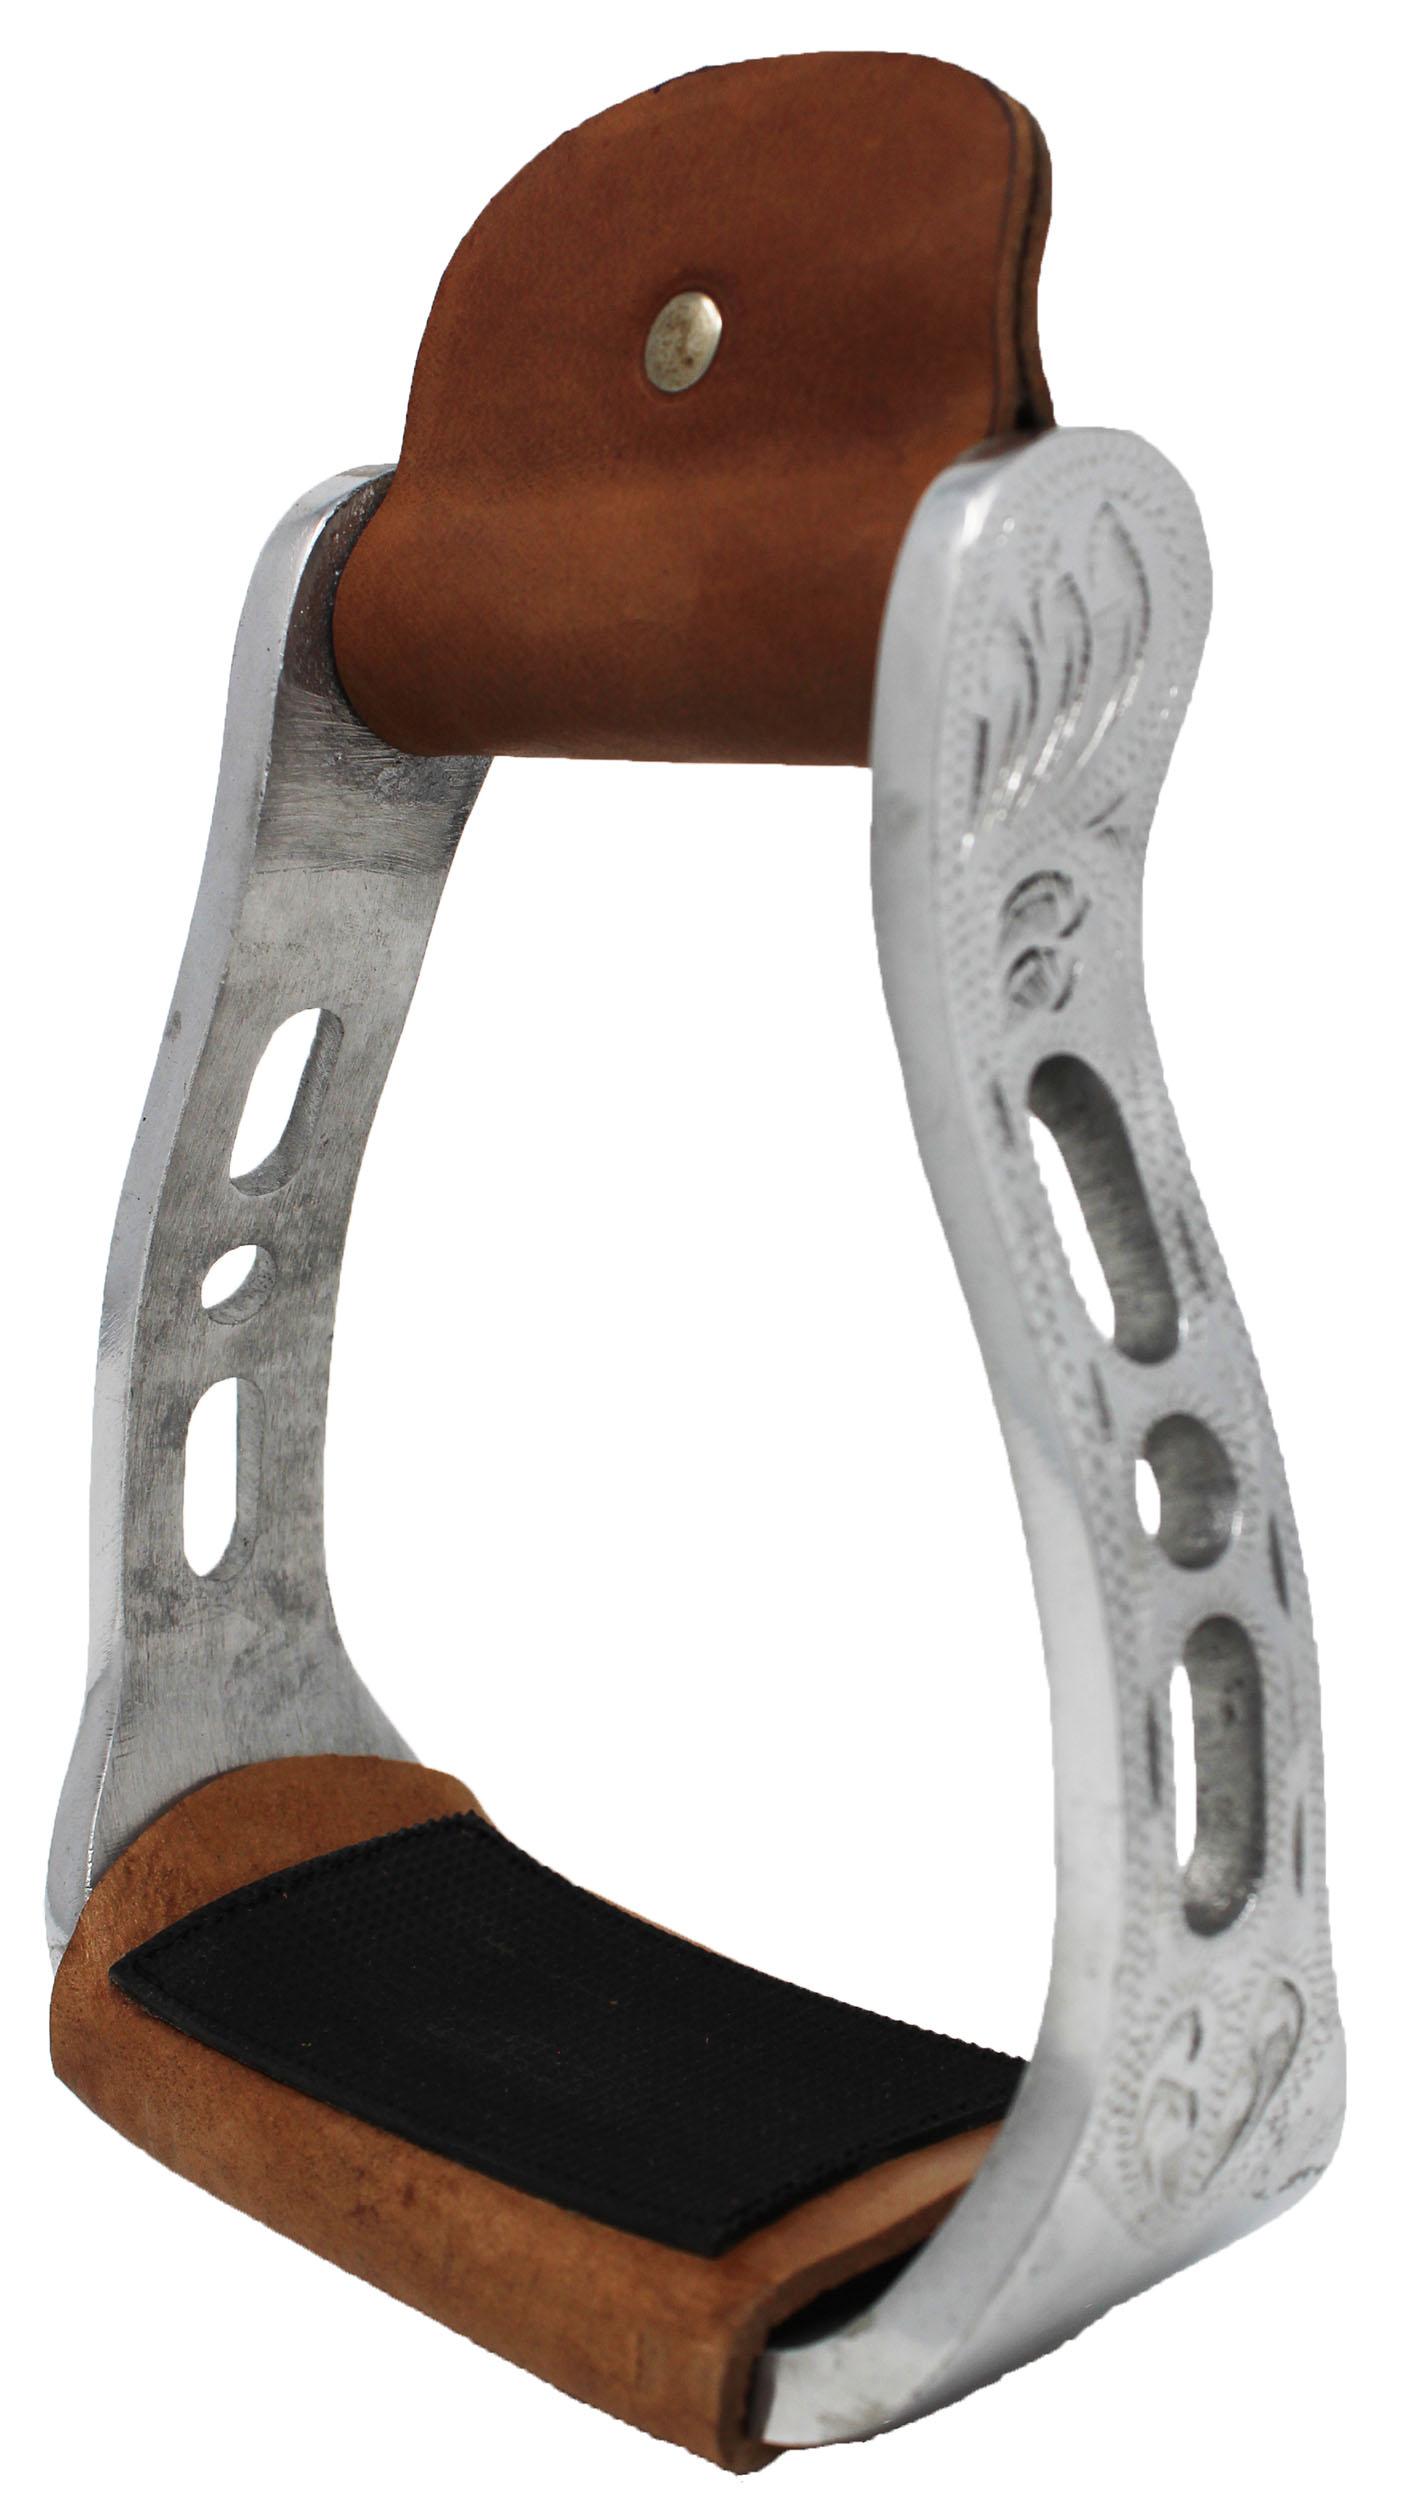 Challenger Tack Horse Saddle Aluminium Western Riding SS Stirrups Leather Tread 51149